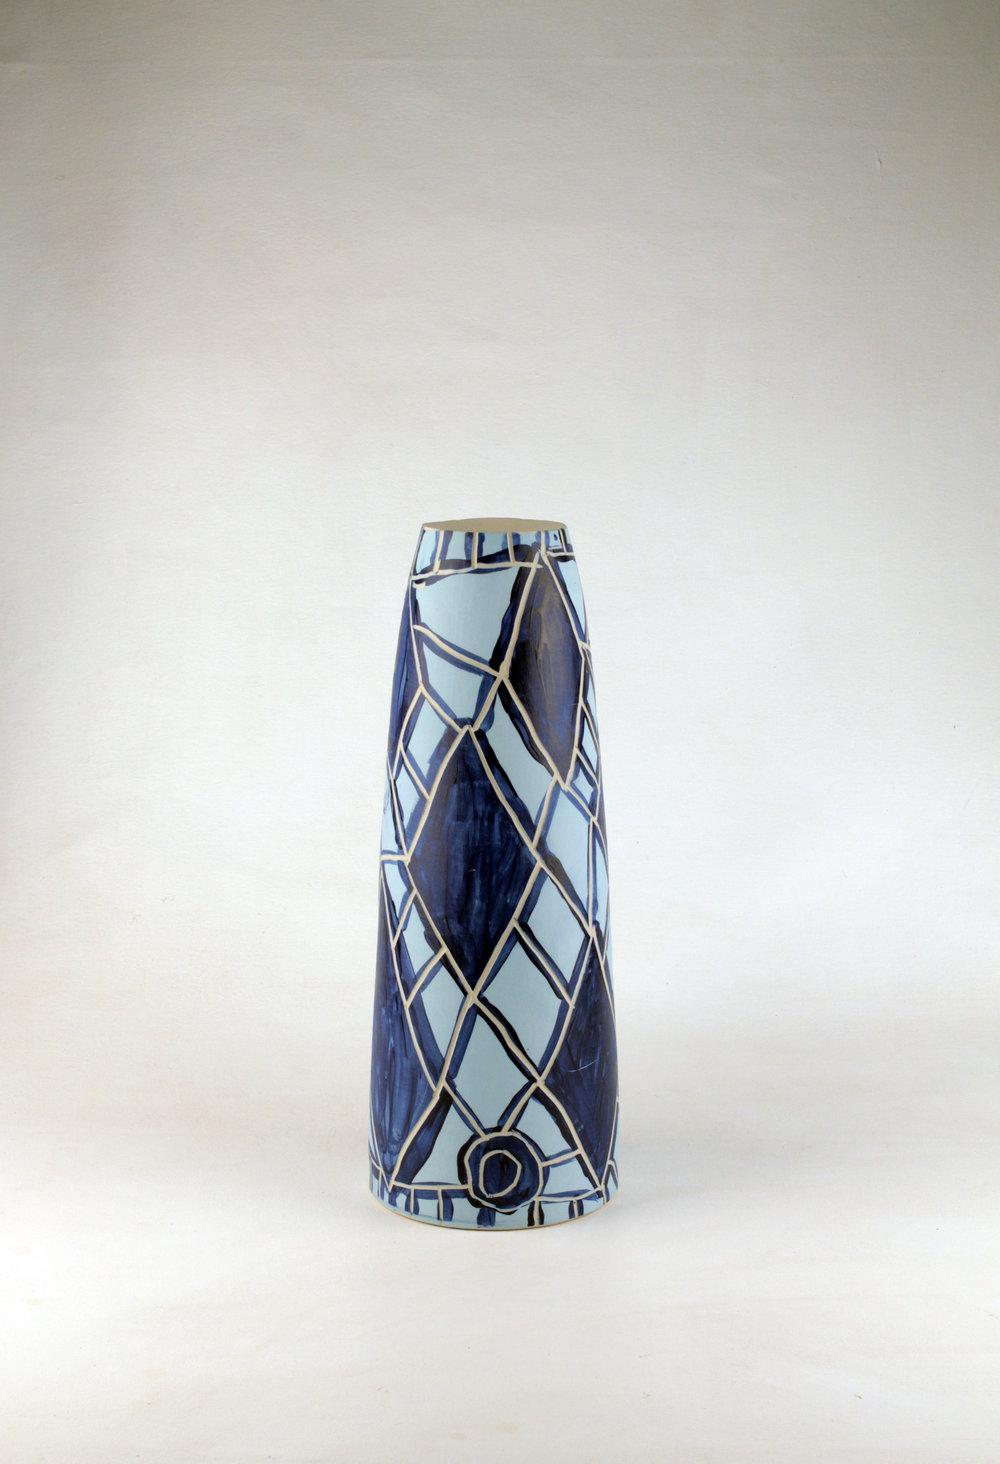 PEPAI JANGALA CARROLL  Walungurru, 2016   430H x 165mm Stoneware Catalog #522C-16   EMAIL INQUIRY